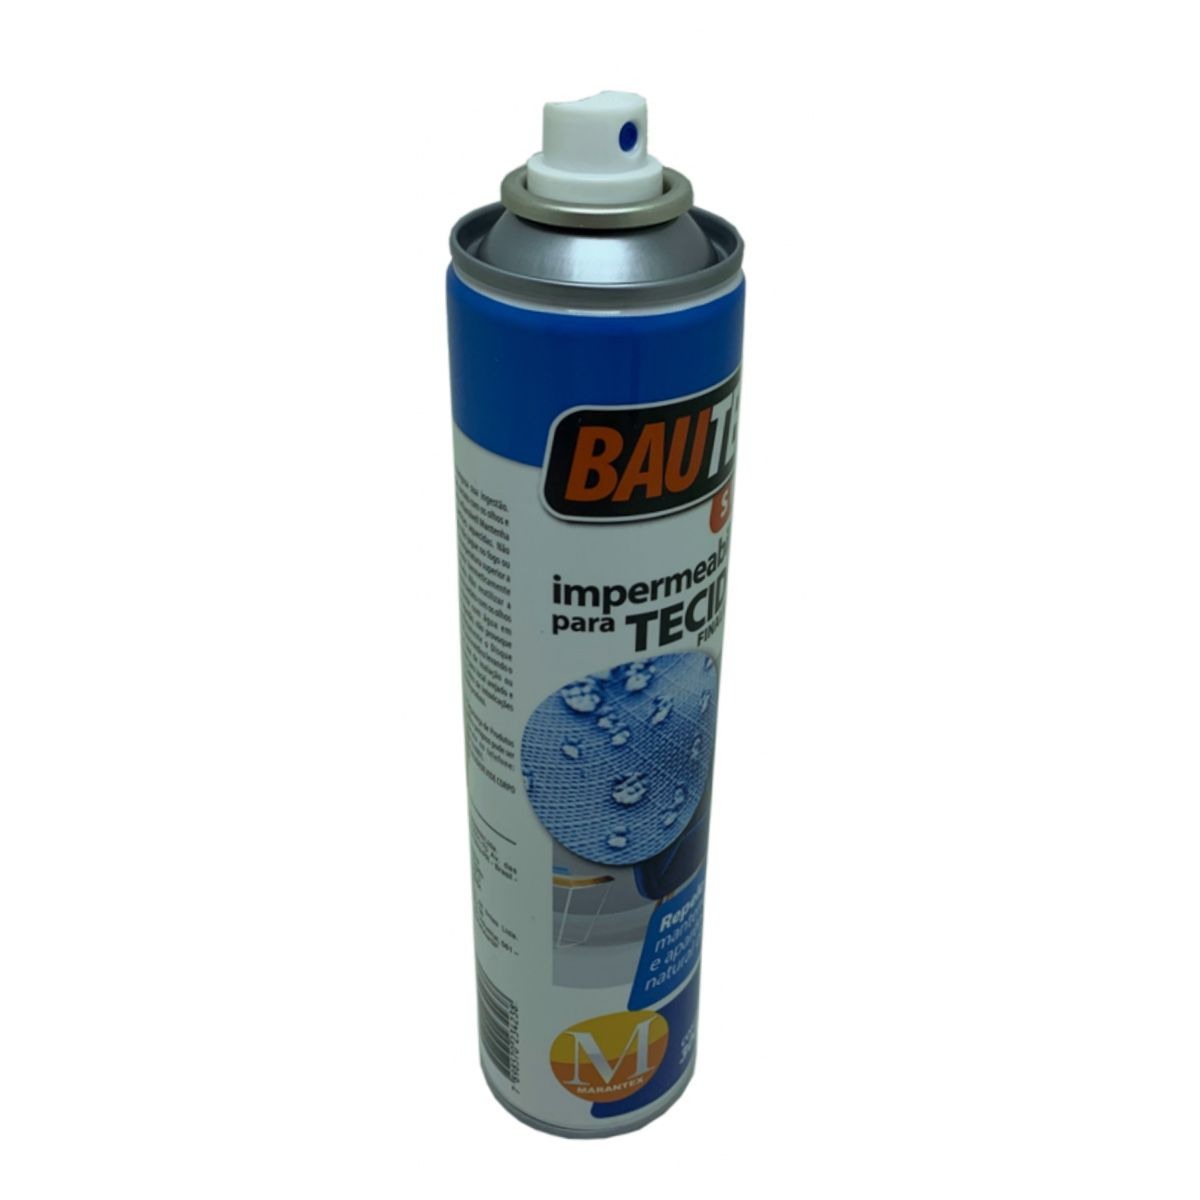 5 UNI Impermeabilizante De Tecido E Estofado Bautech 300ml